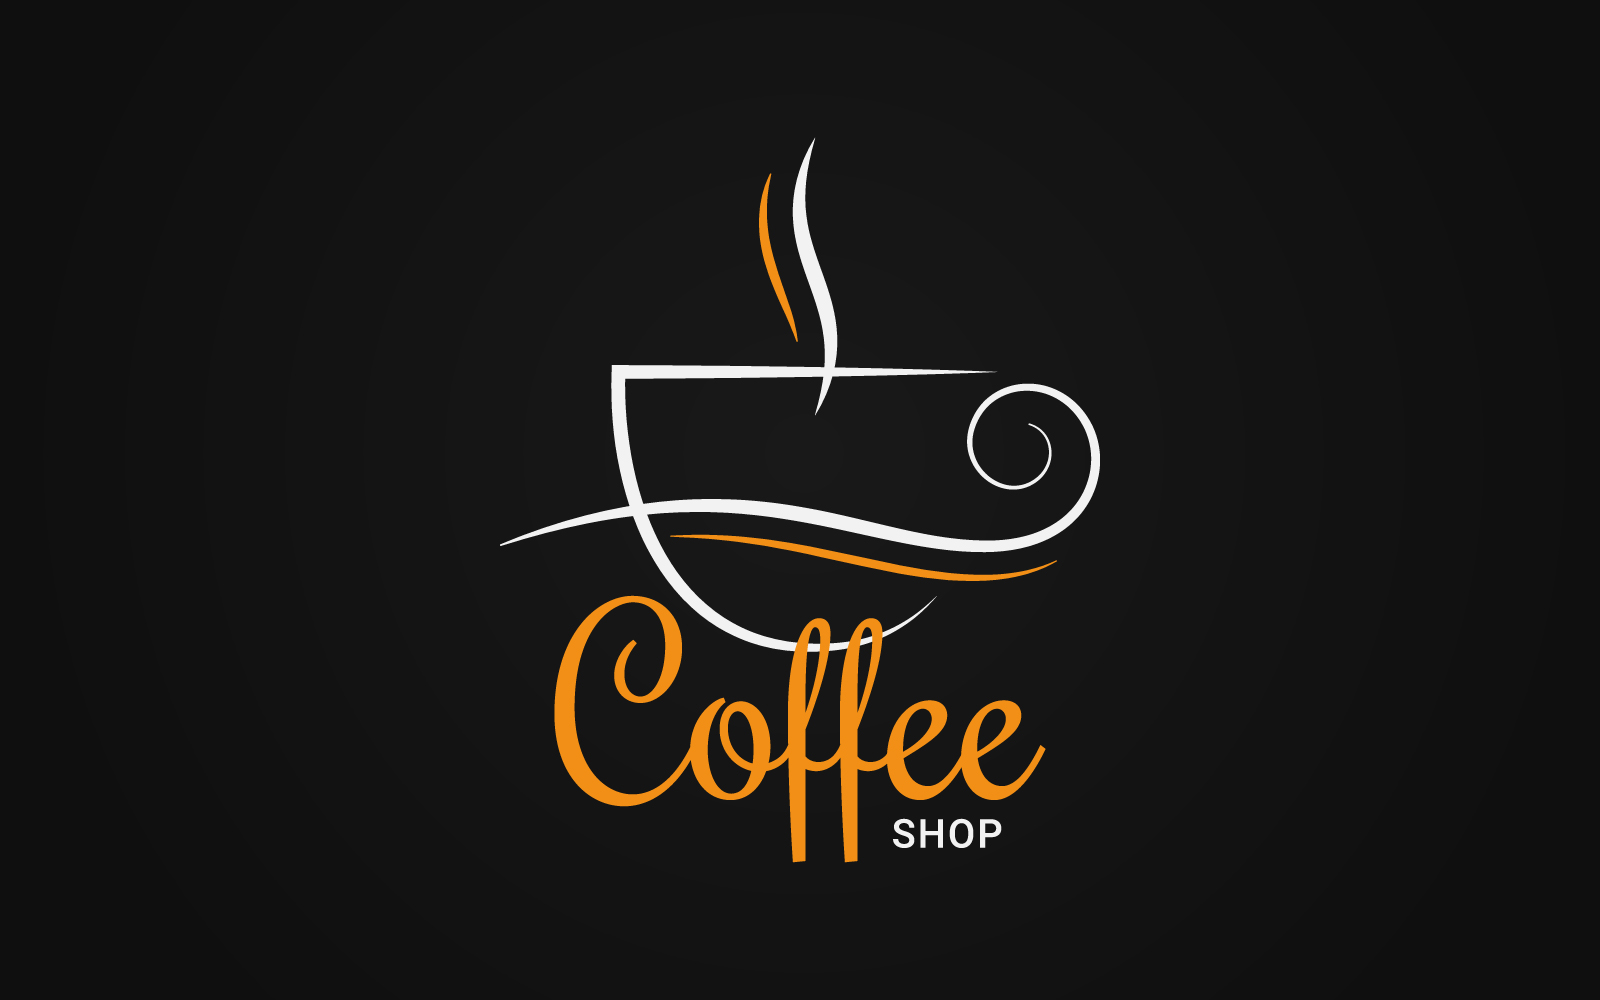 Artistic Coffee Сup Logo on Black Background Logo template